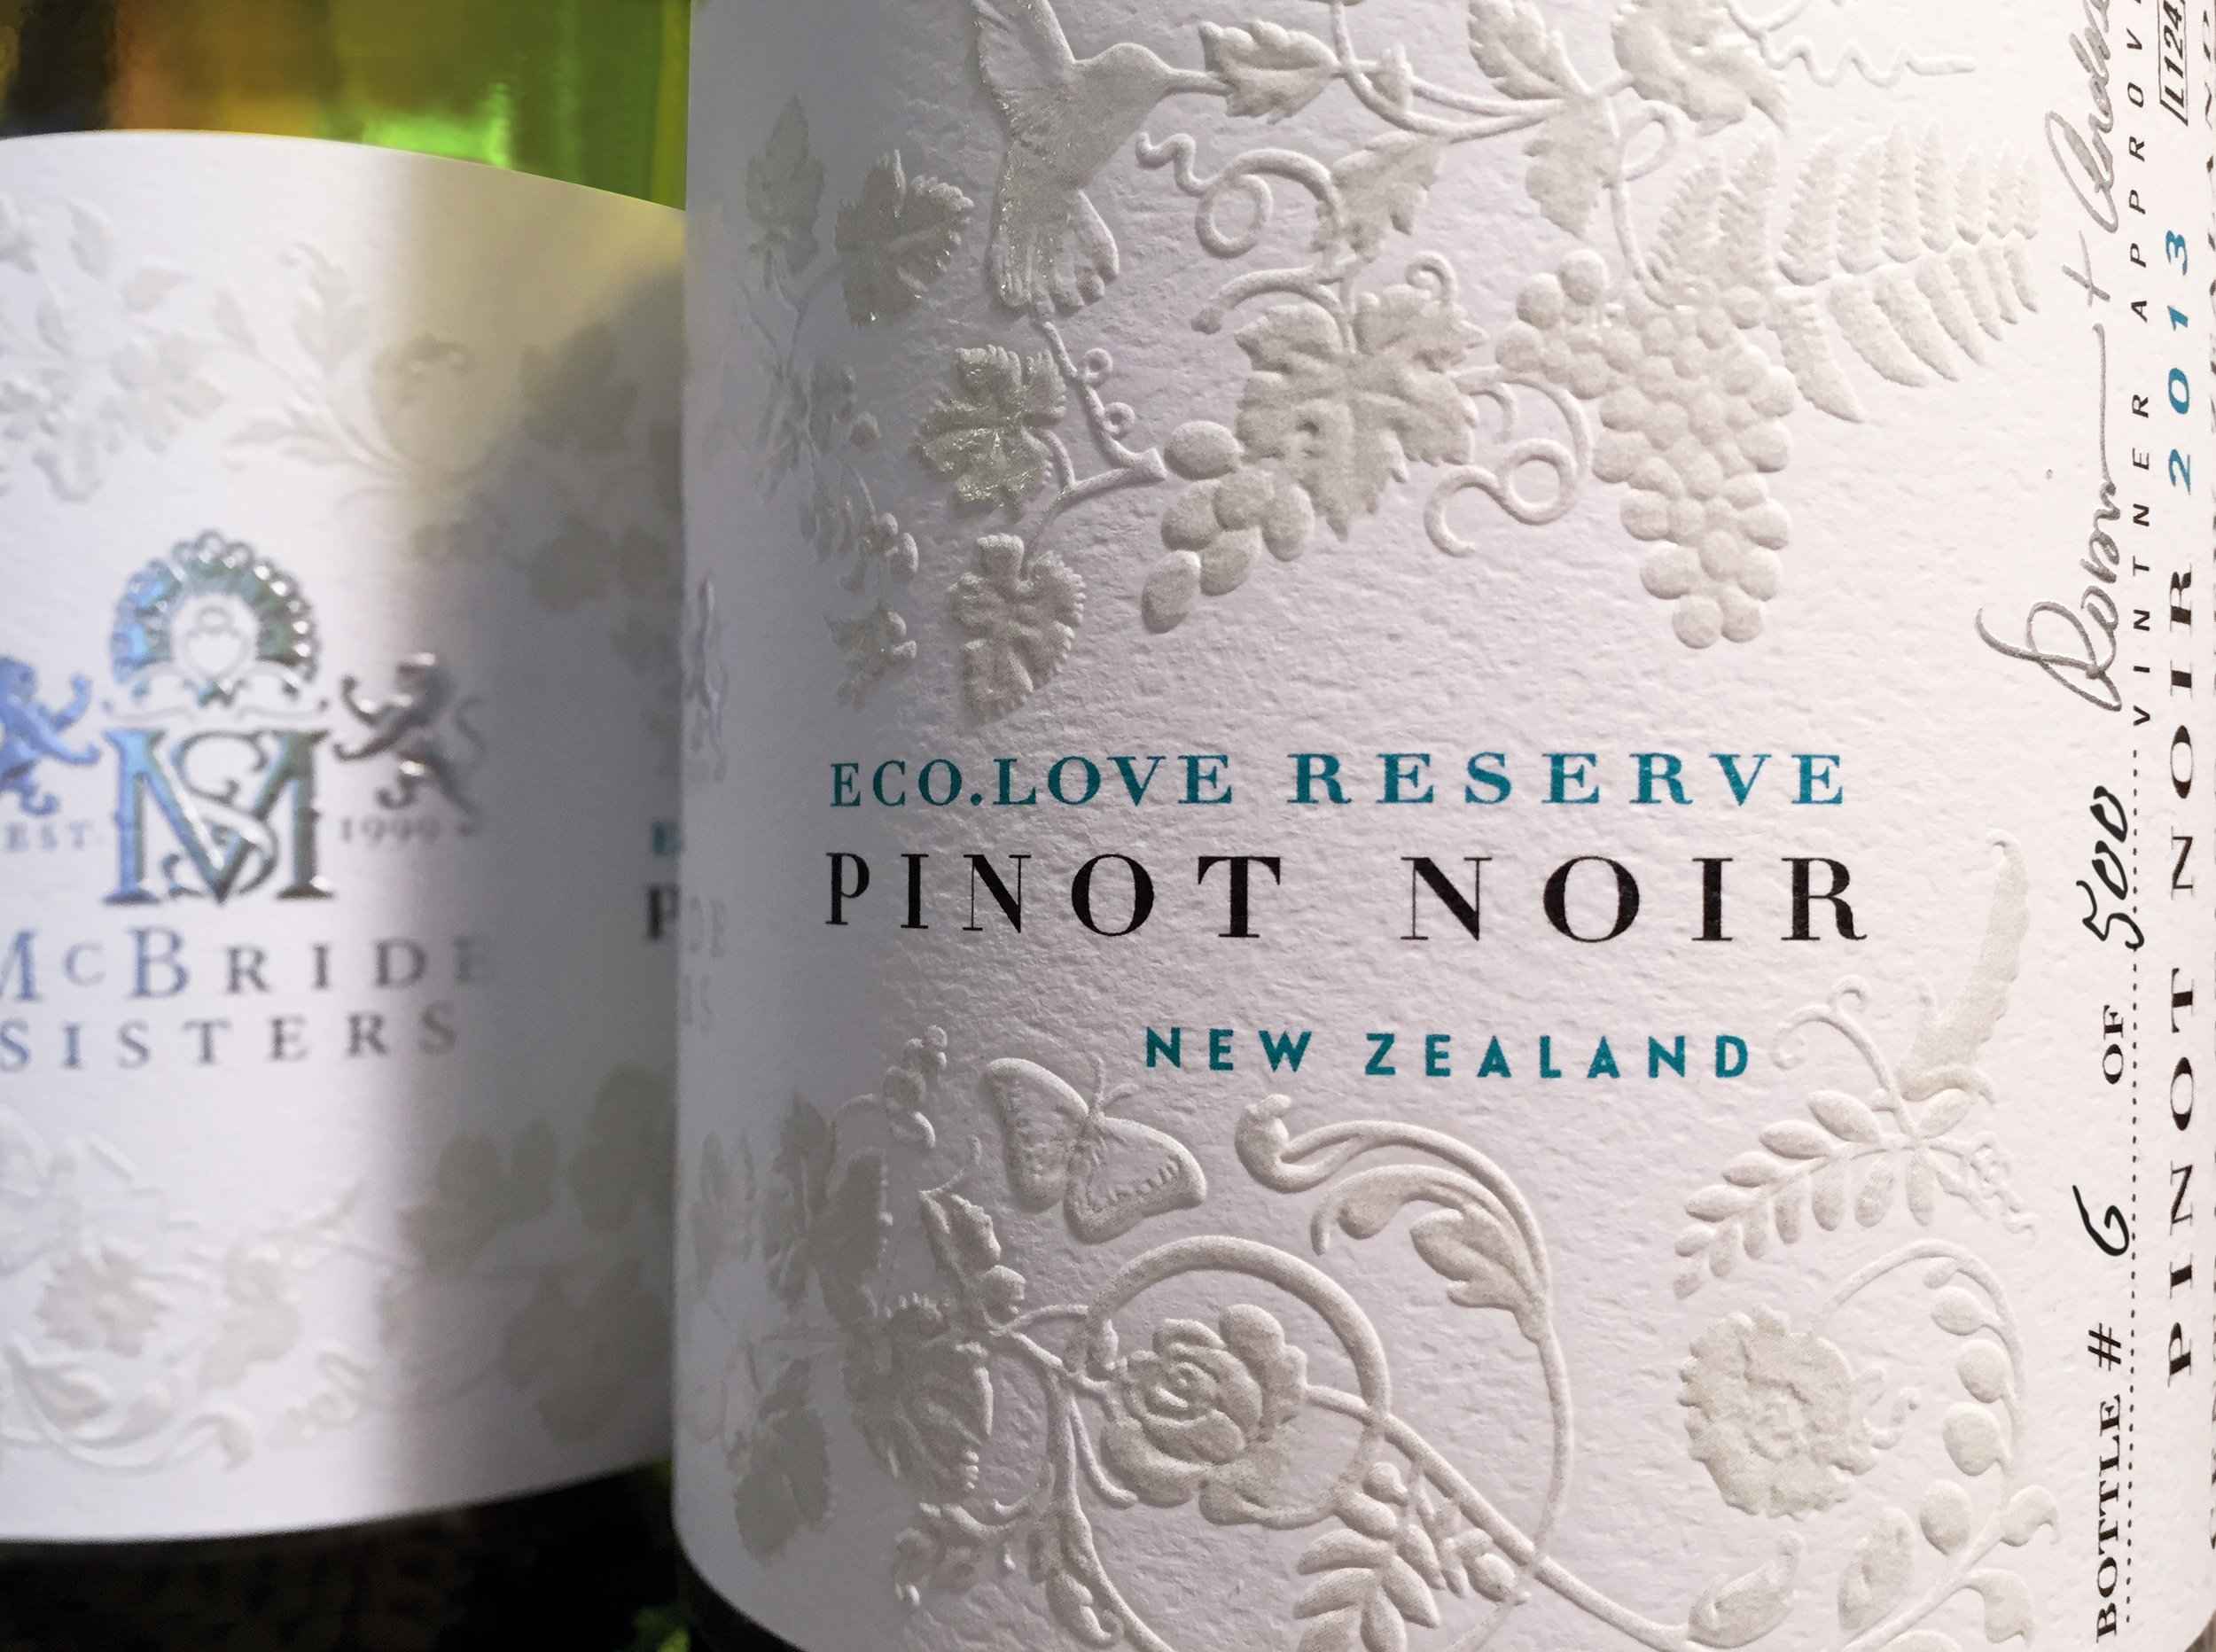 ecolove-reserve-pinotnoir-closeup-bottle-2016.jpg